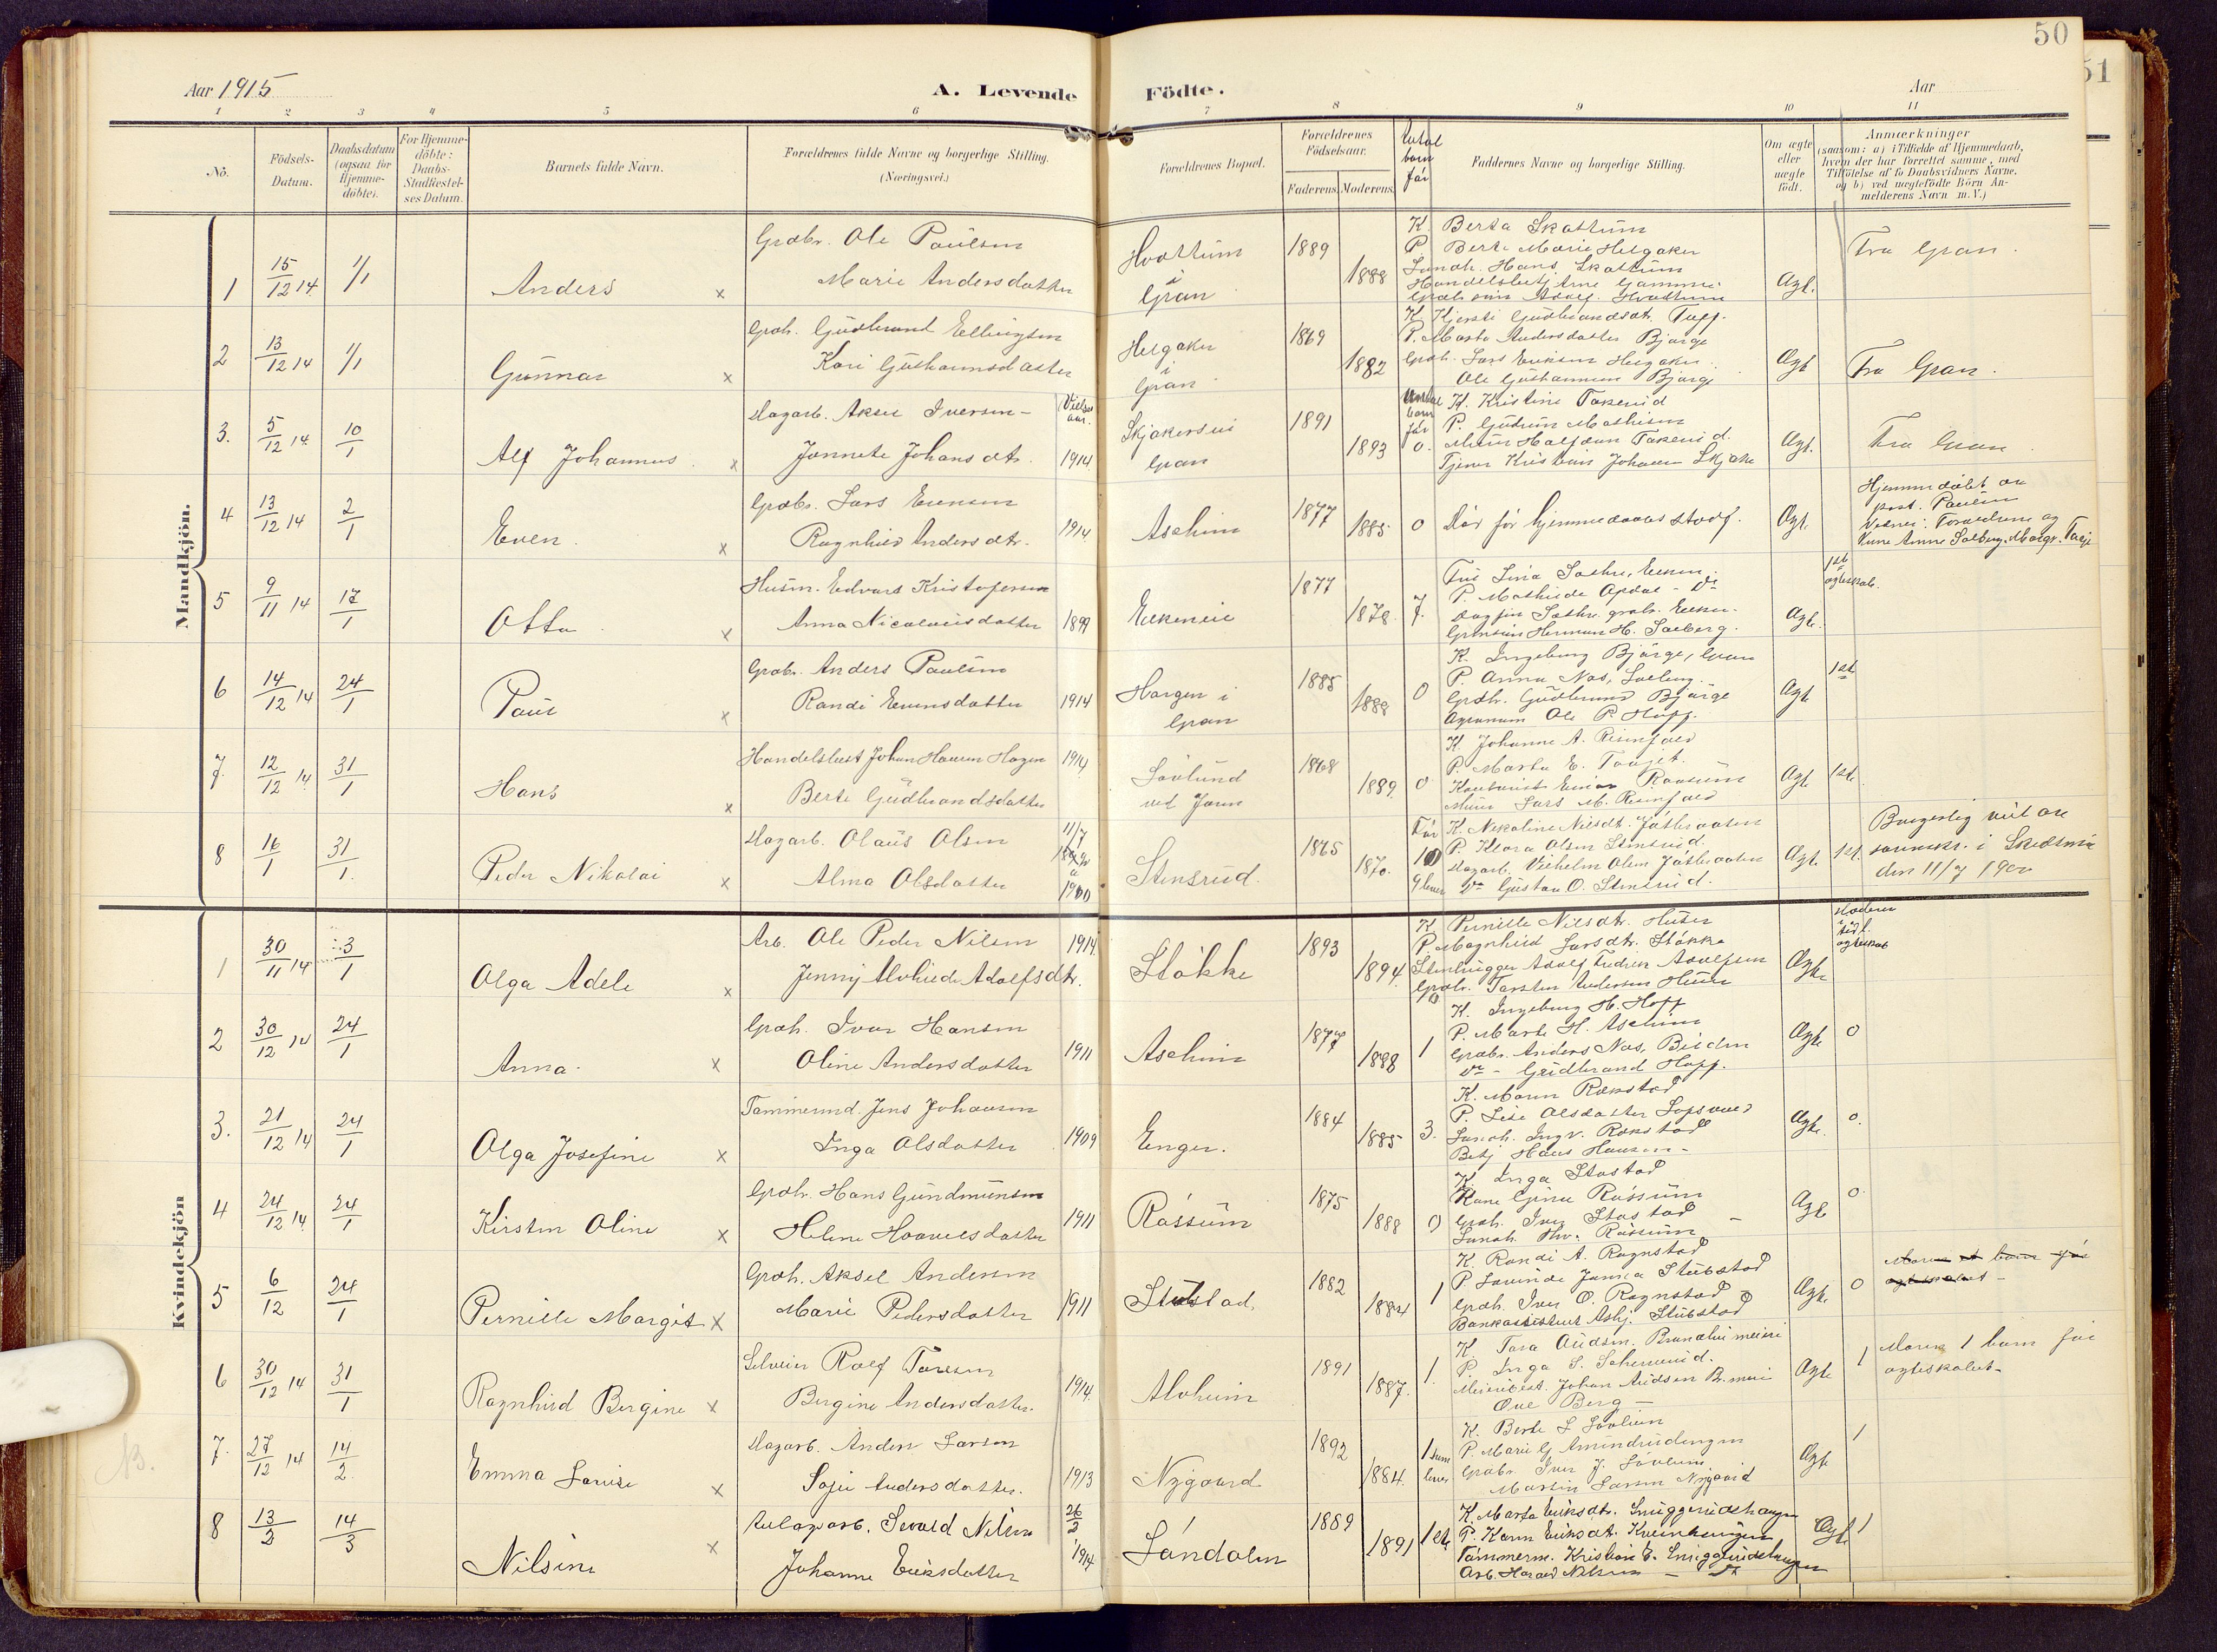 SAH, Brandbu prestekontor, Klokkerbok nr. 9, 1903-1916, s. 50